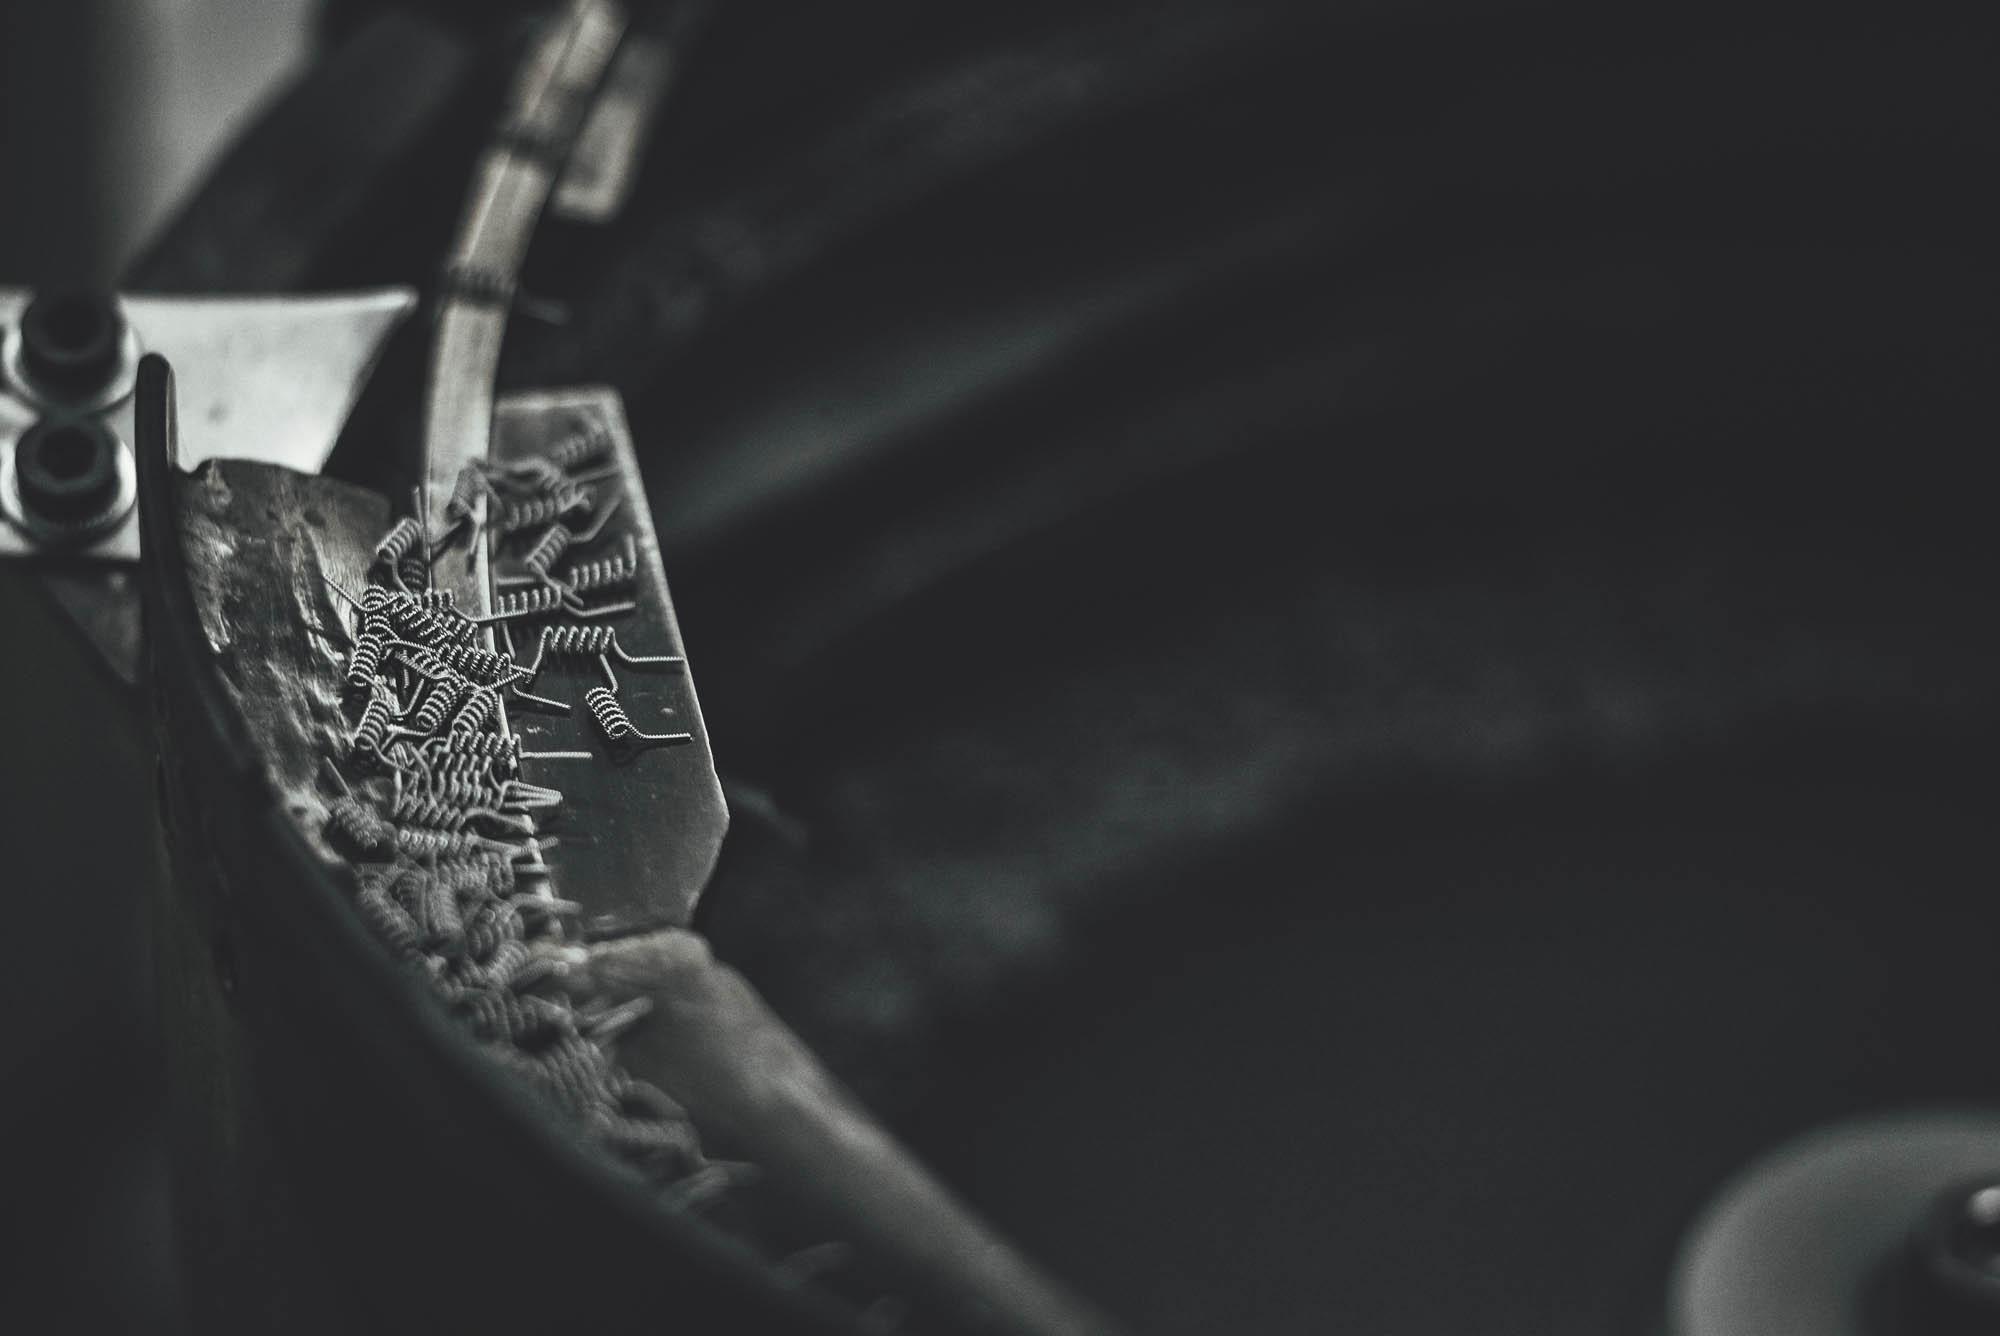 seifertuebler-corporate-osram-filamentbulb-02.jpg